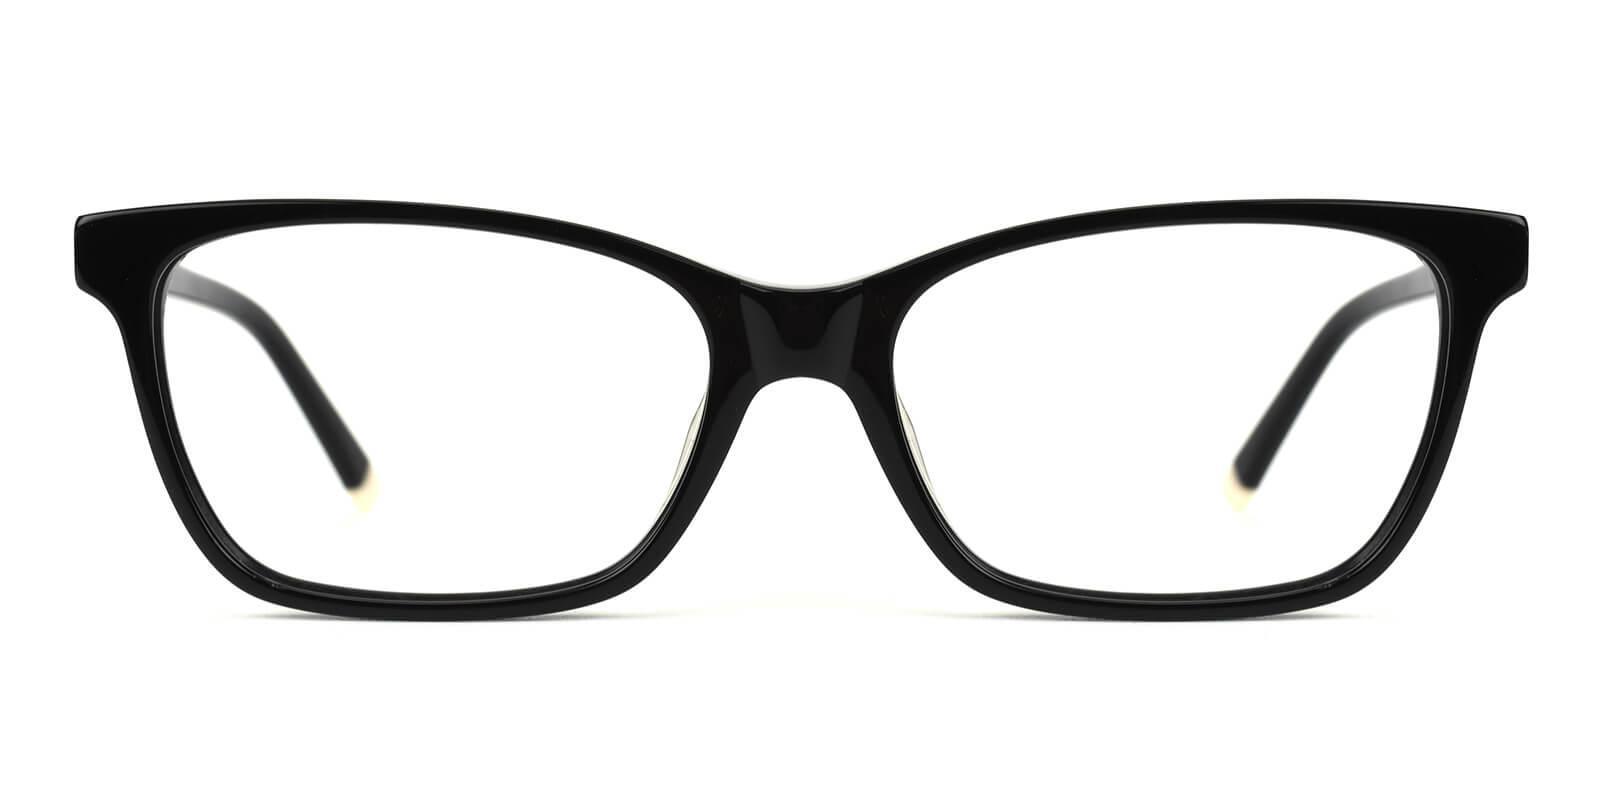 Waferay-Black-Cat-Acetate-Eyeglasses-additional2